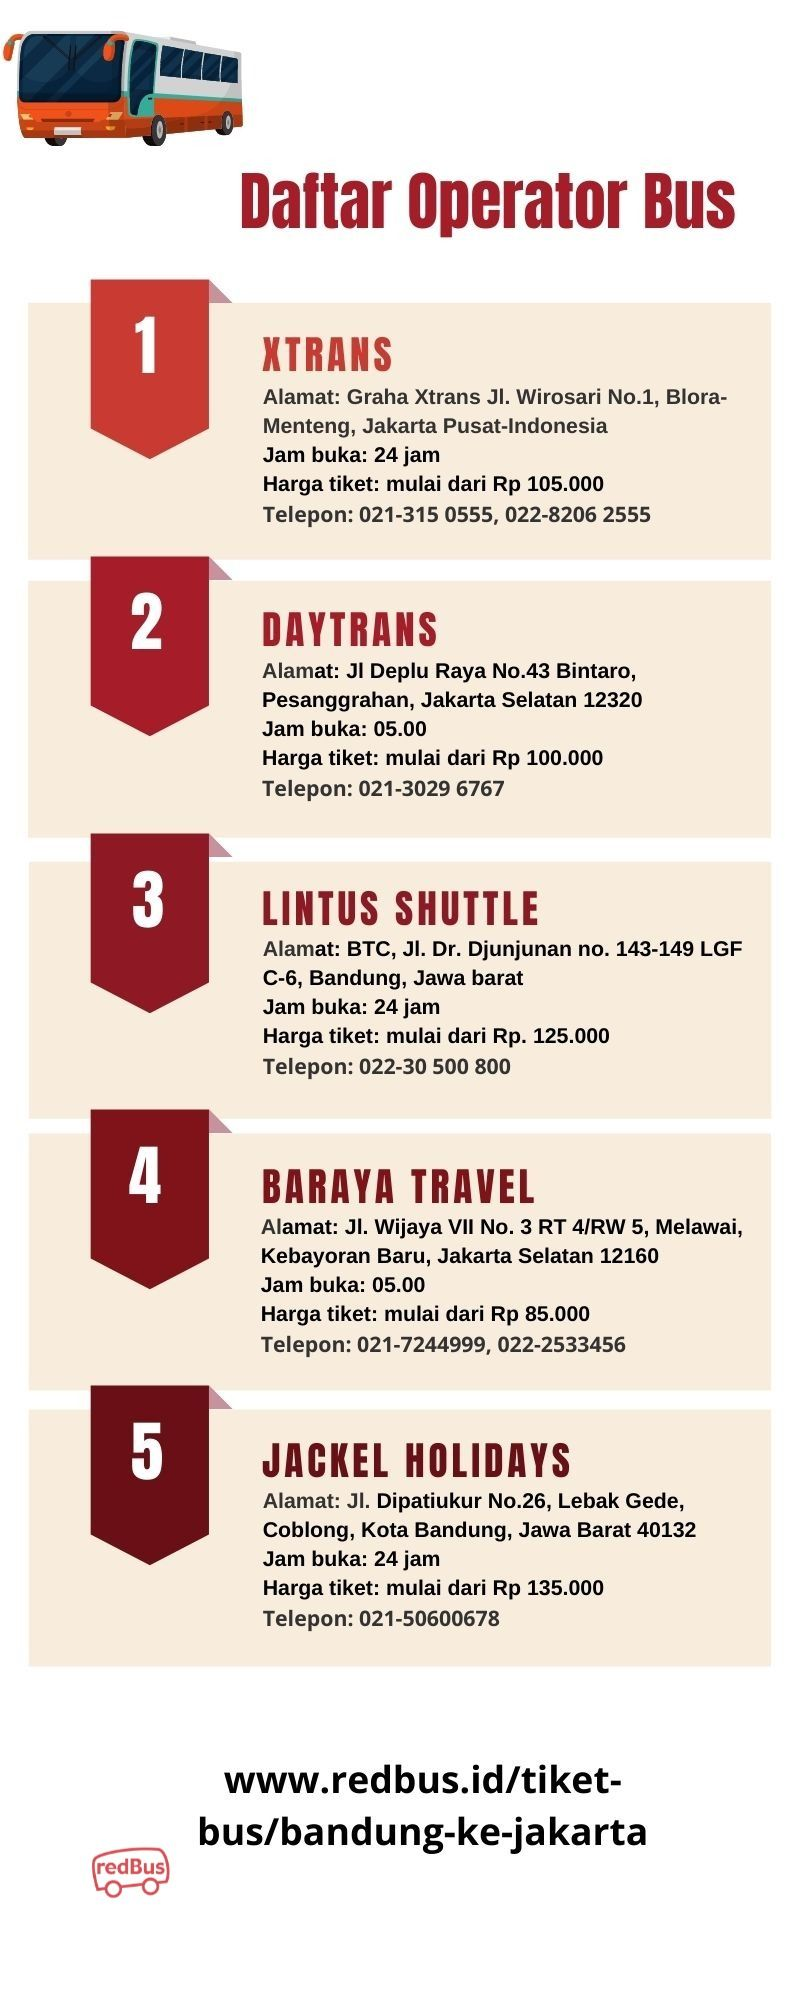 Harga Travel Bandung Jakarta : harga, travel, bandung, jakarta, Daftar, Operator, Bandung, Jakarta, Perjalanan